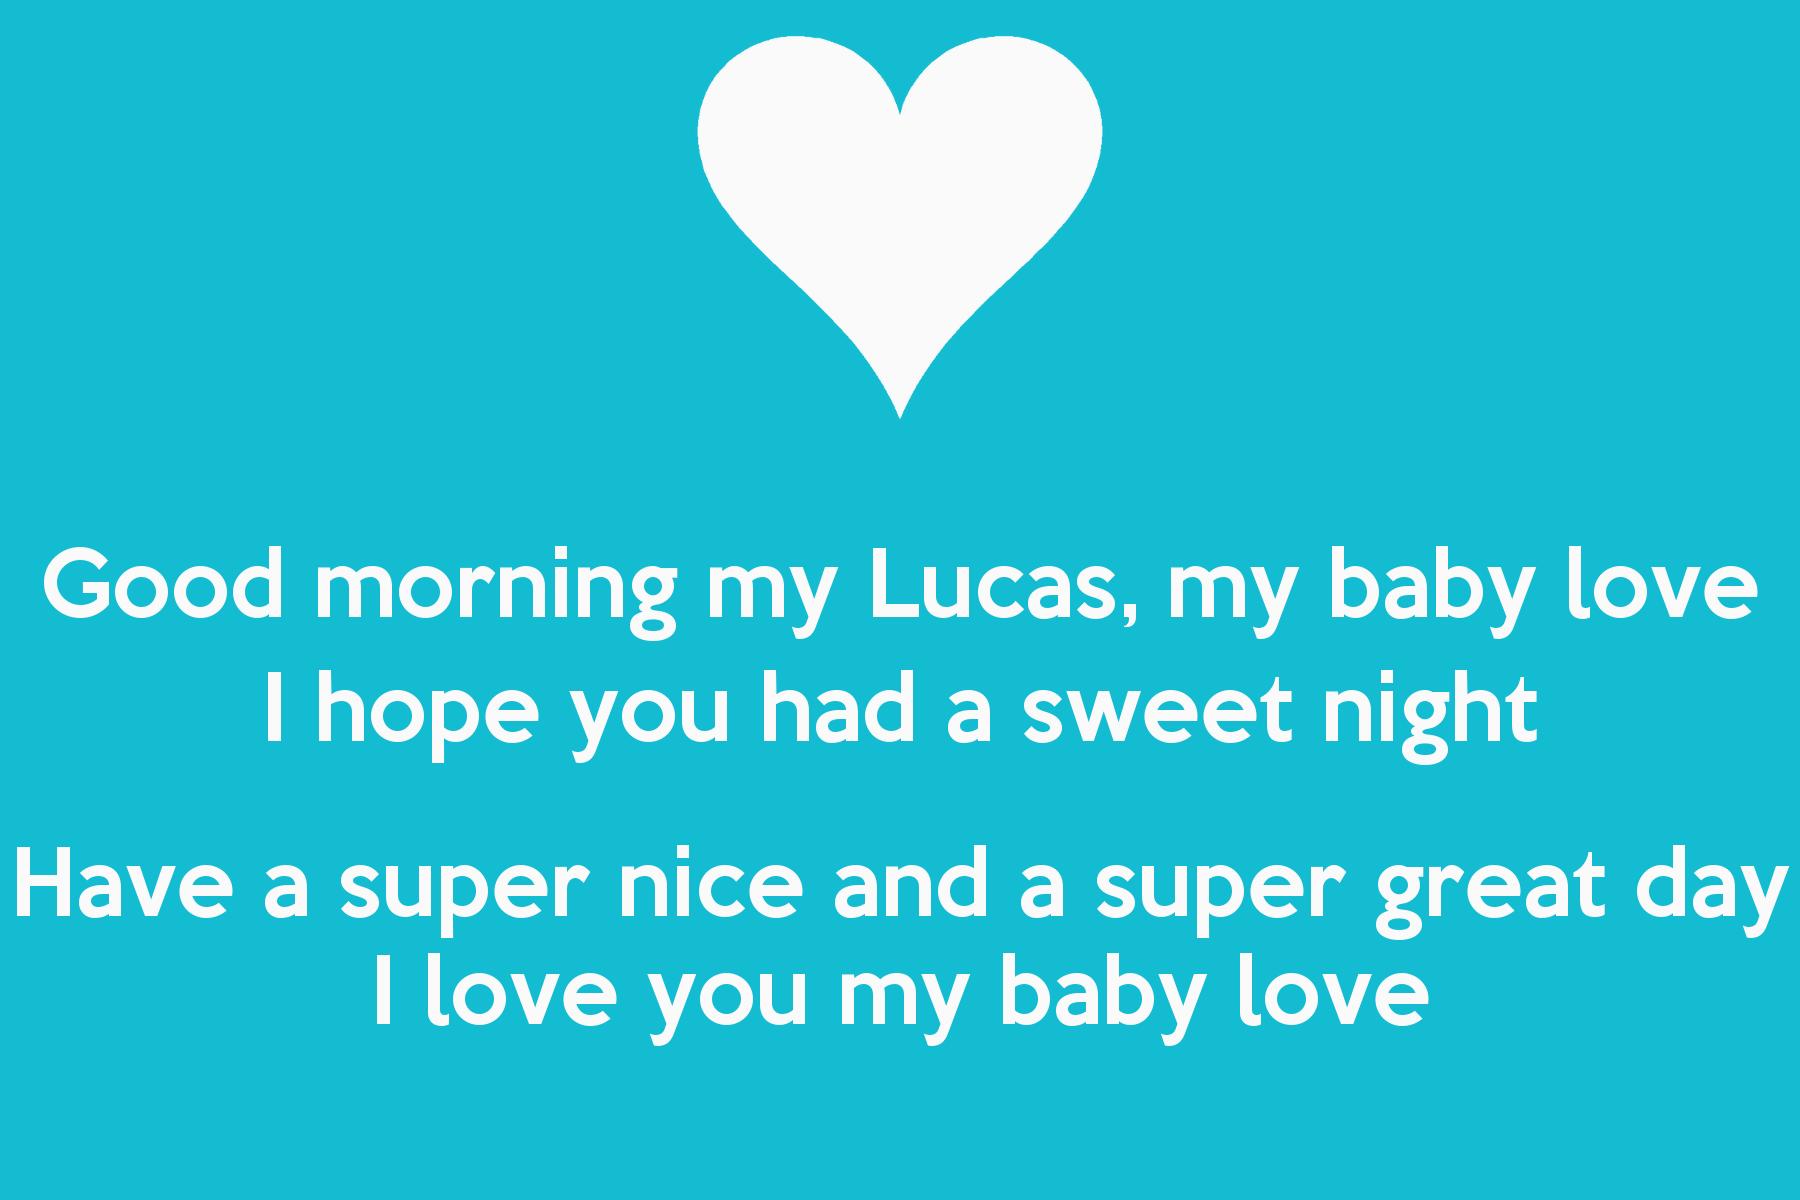 Love My Baby Wallpaper : Good Day My Love Wallpapers - WallpaperSafari